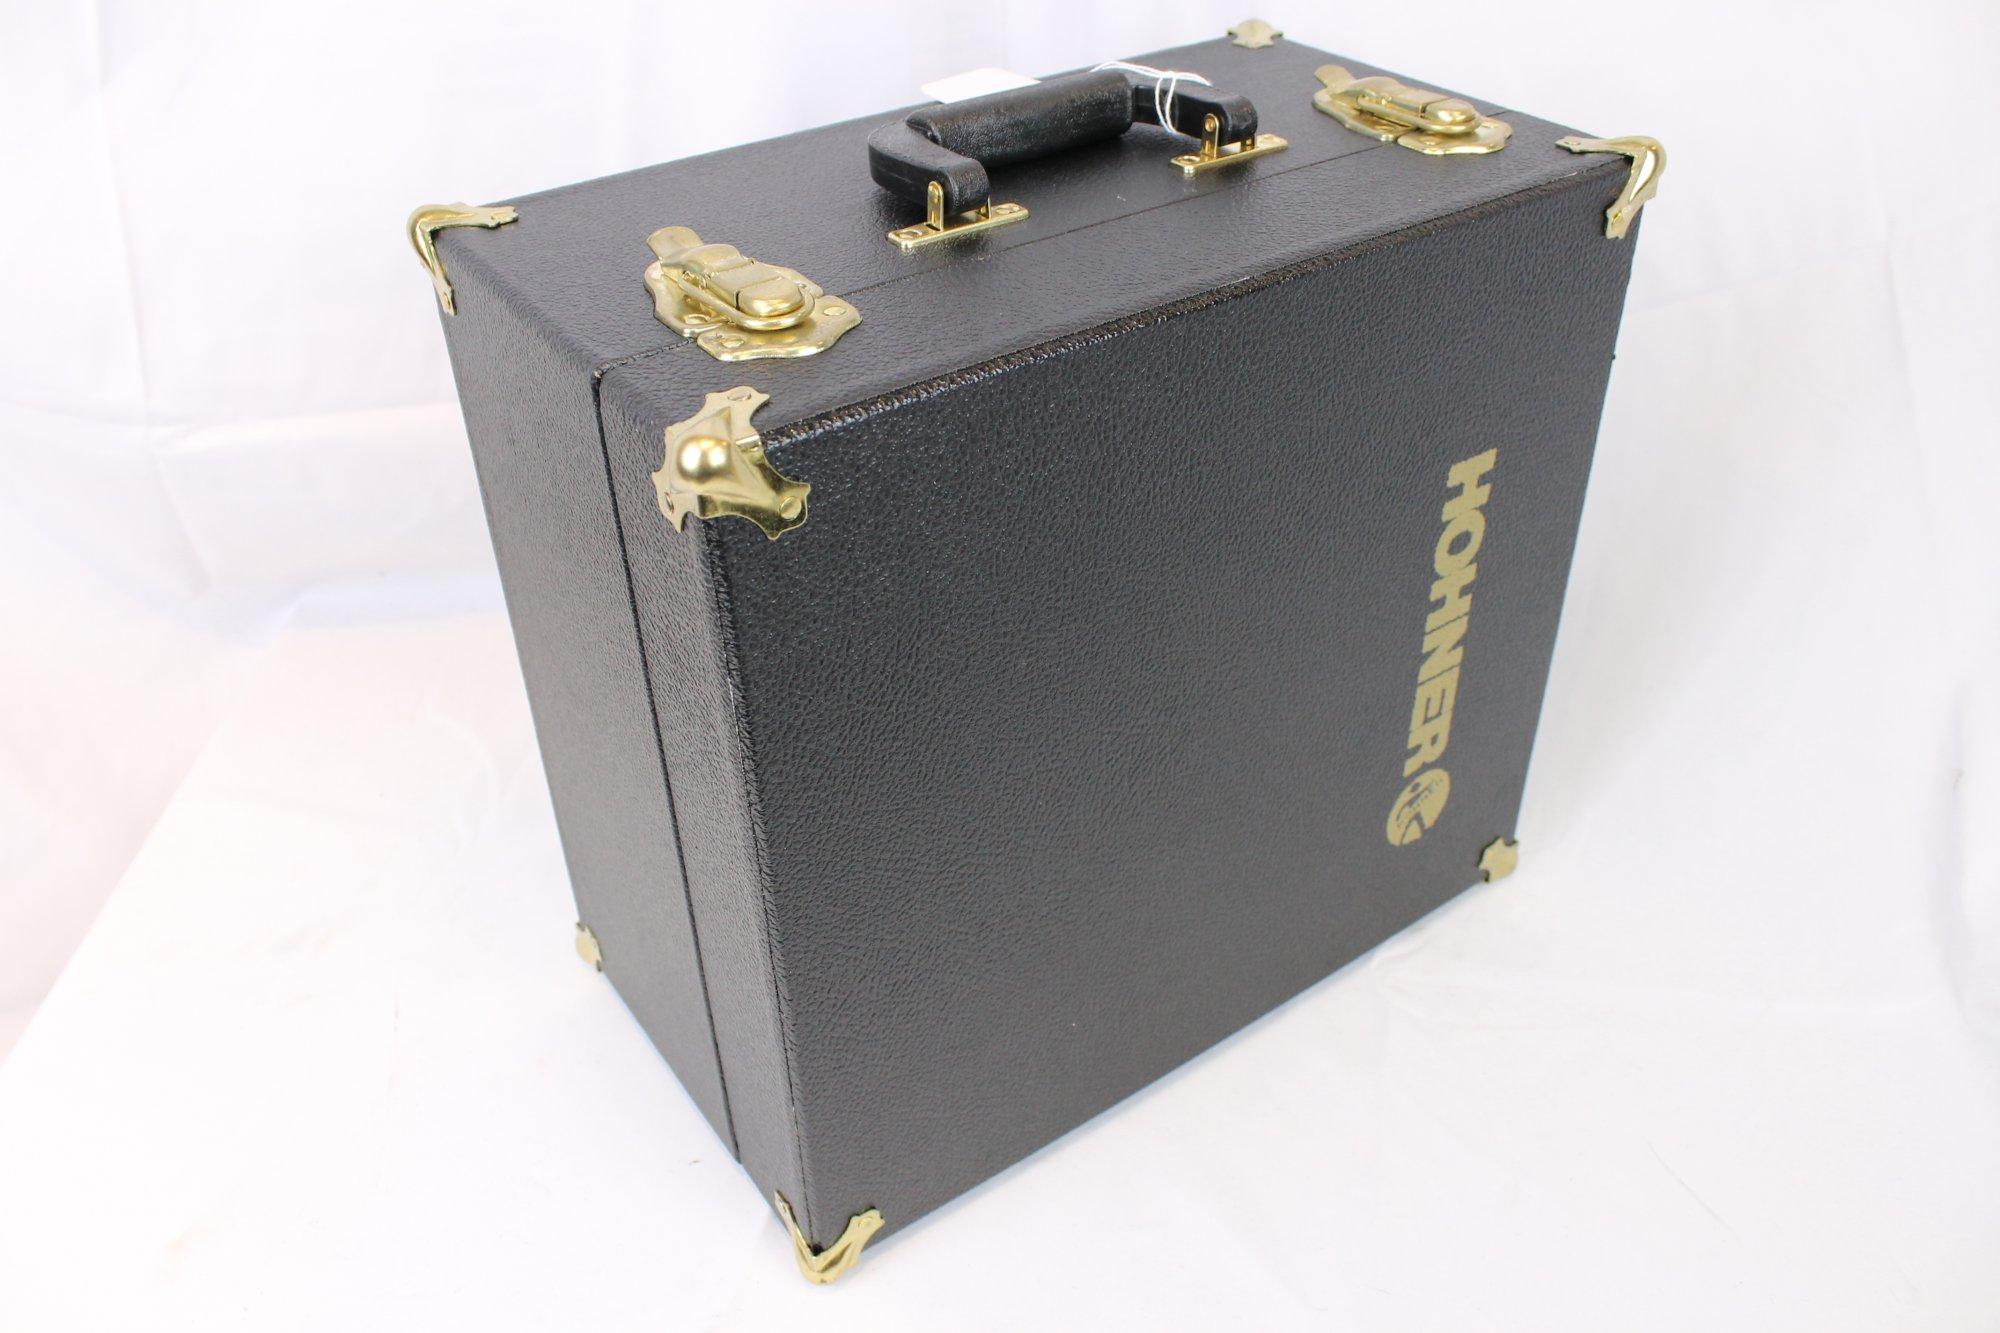 Black Hohner Accordion Hard Case 13.75 x 12.5 x 8 (35 cm x 32cm x 20cm)